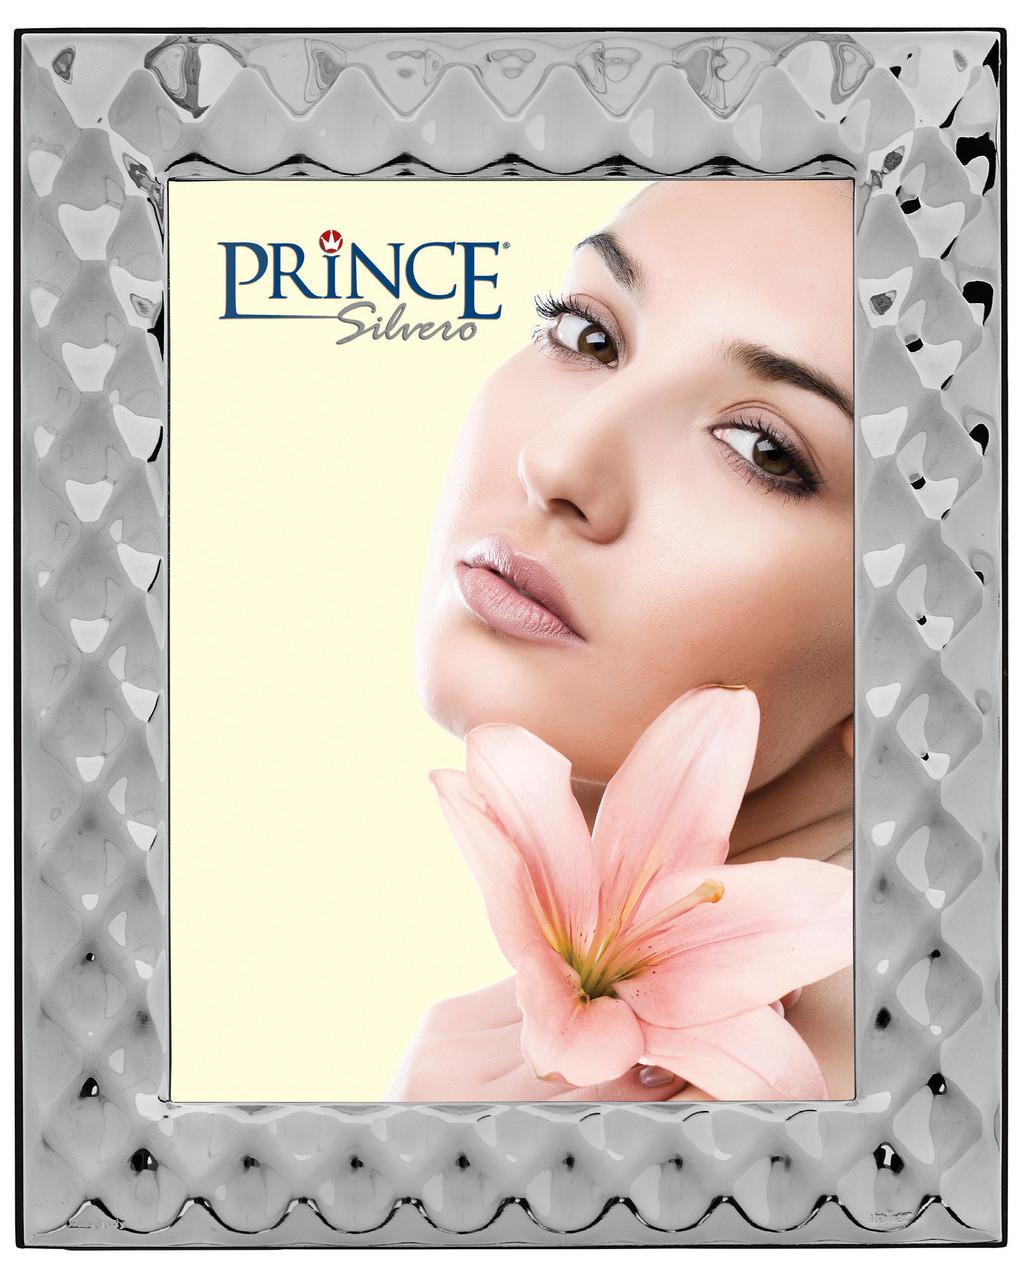 Красивая фоторамка 20Χ25 Prince Silvreo